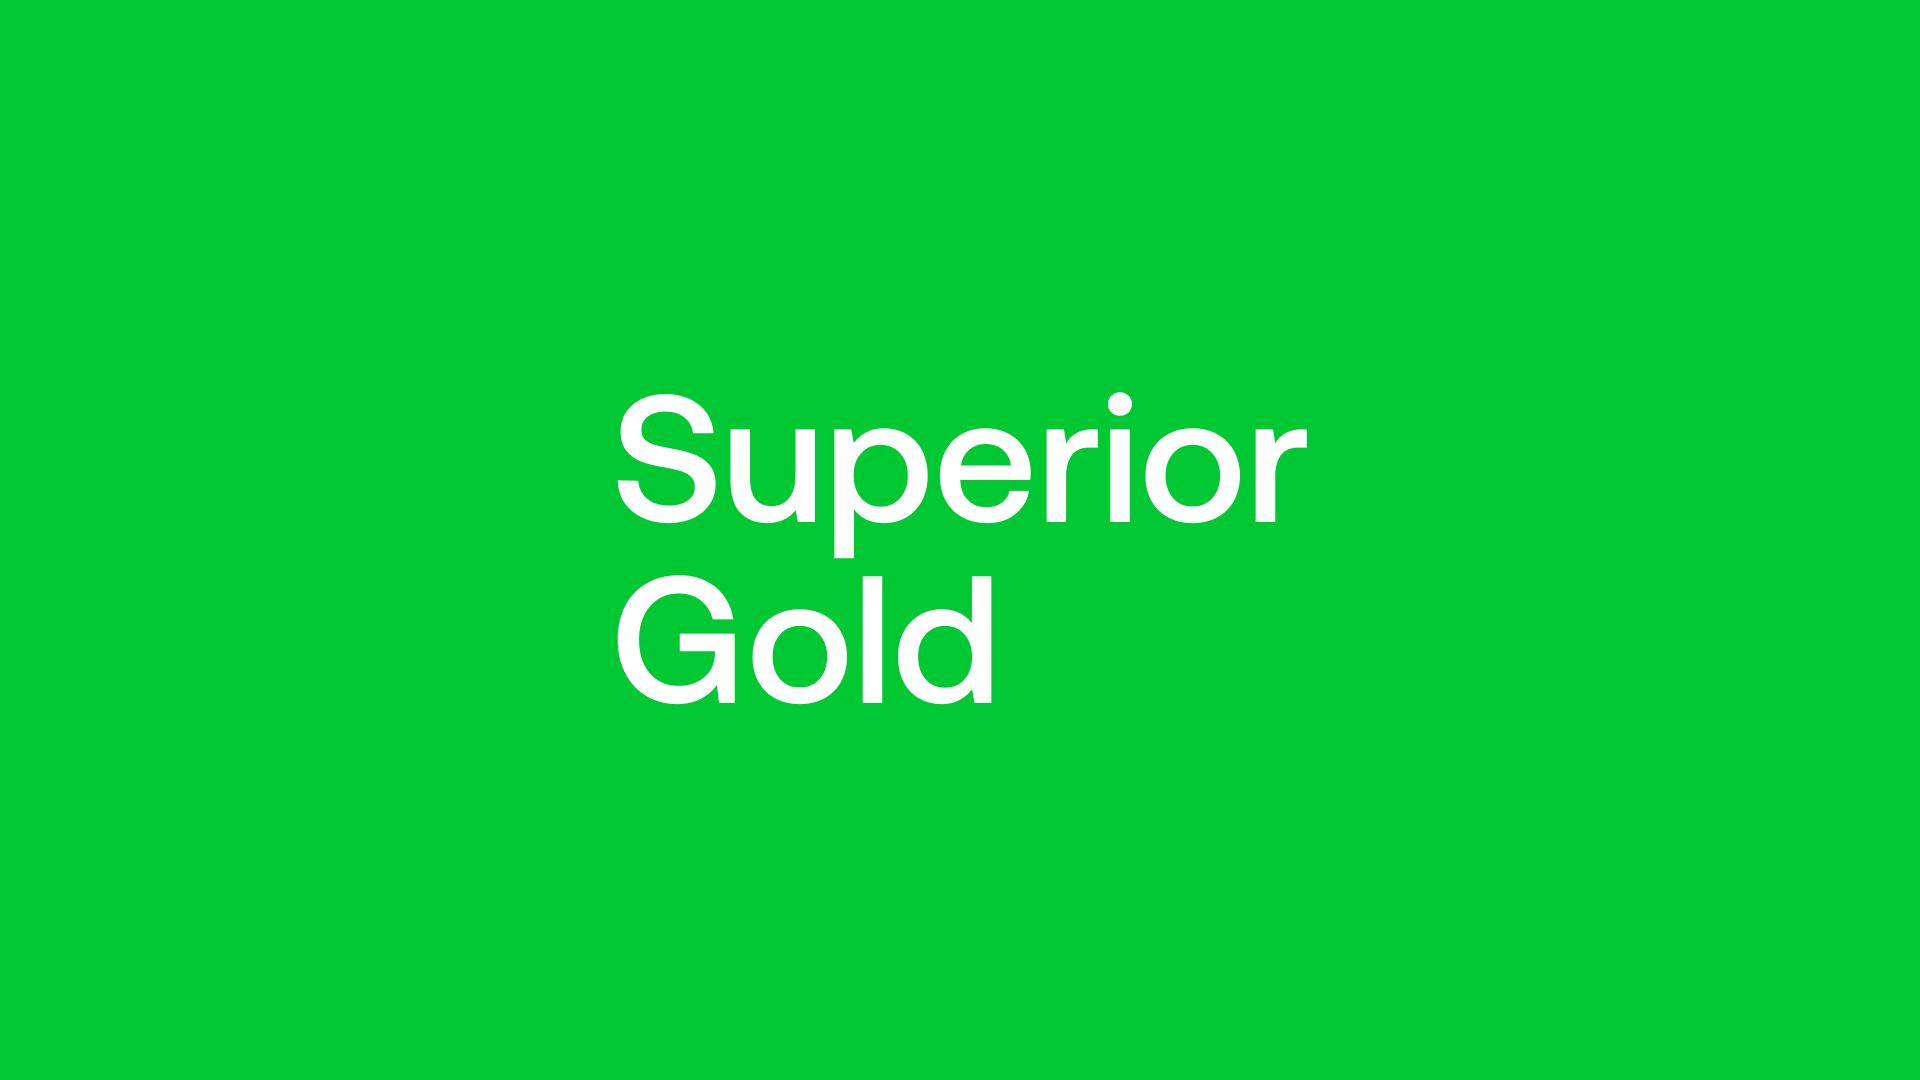 Superior Gold (SGI) - Turnaround Story Starting to Take Hold